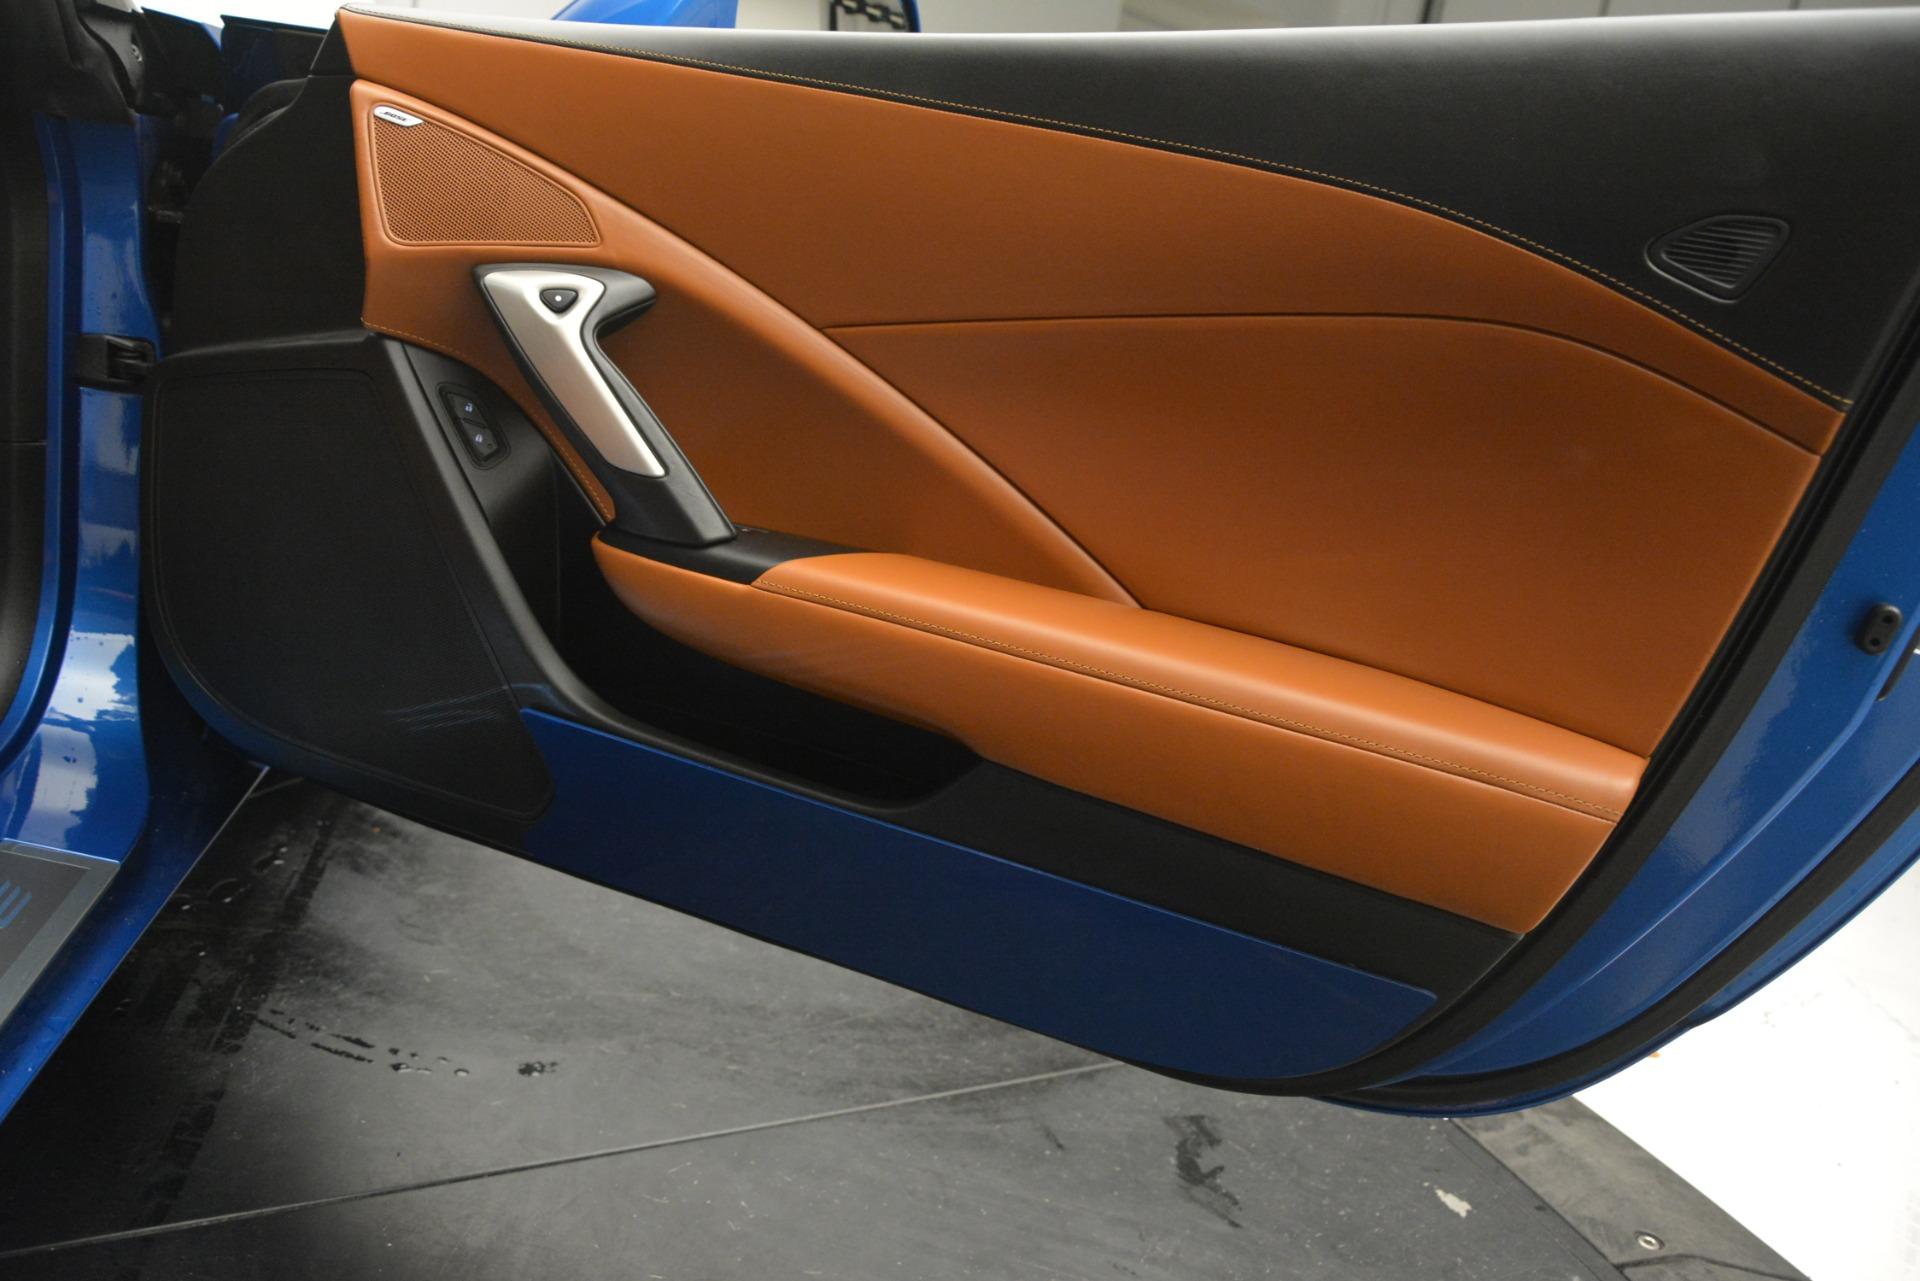 Used 2014 Chevrolet Corvette Stingray Z51 For Sale In Greenwich, CT 2703_p28